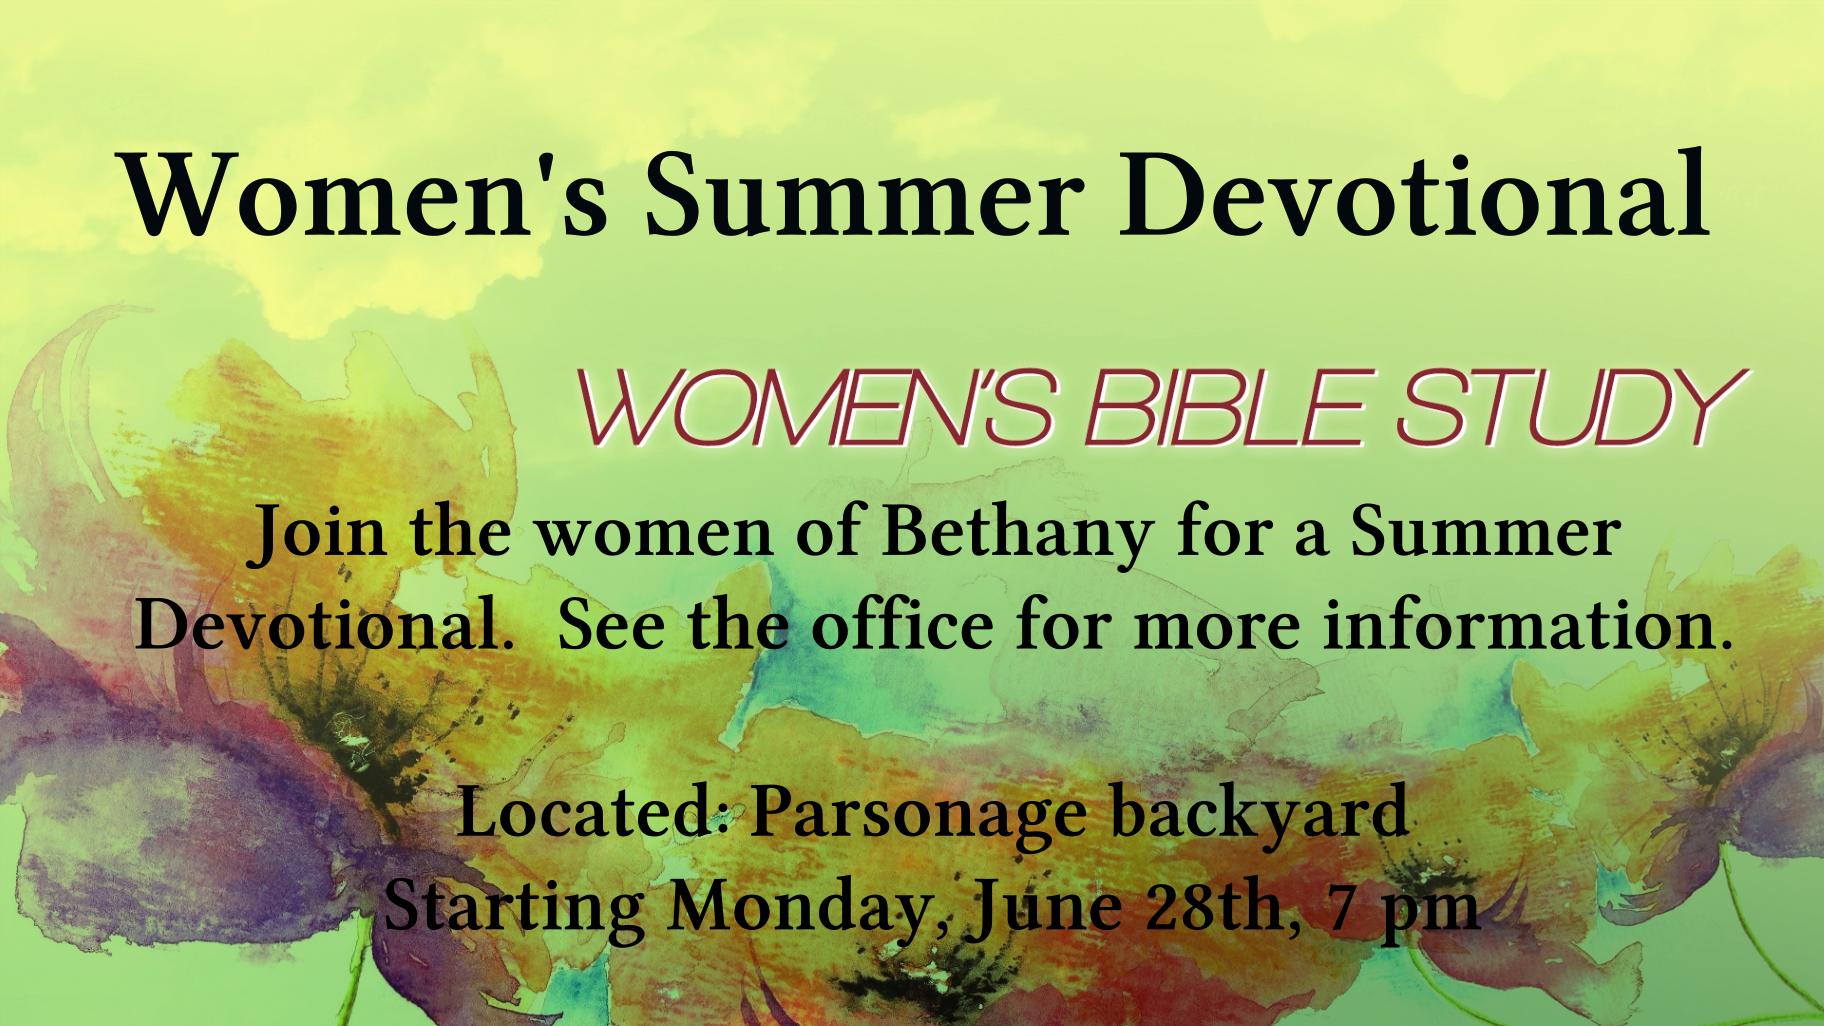 Women's Summer Devotional